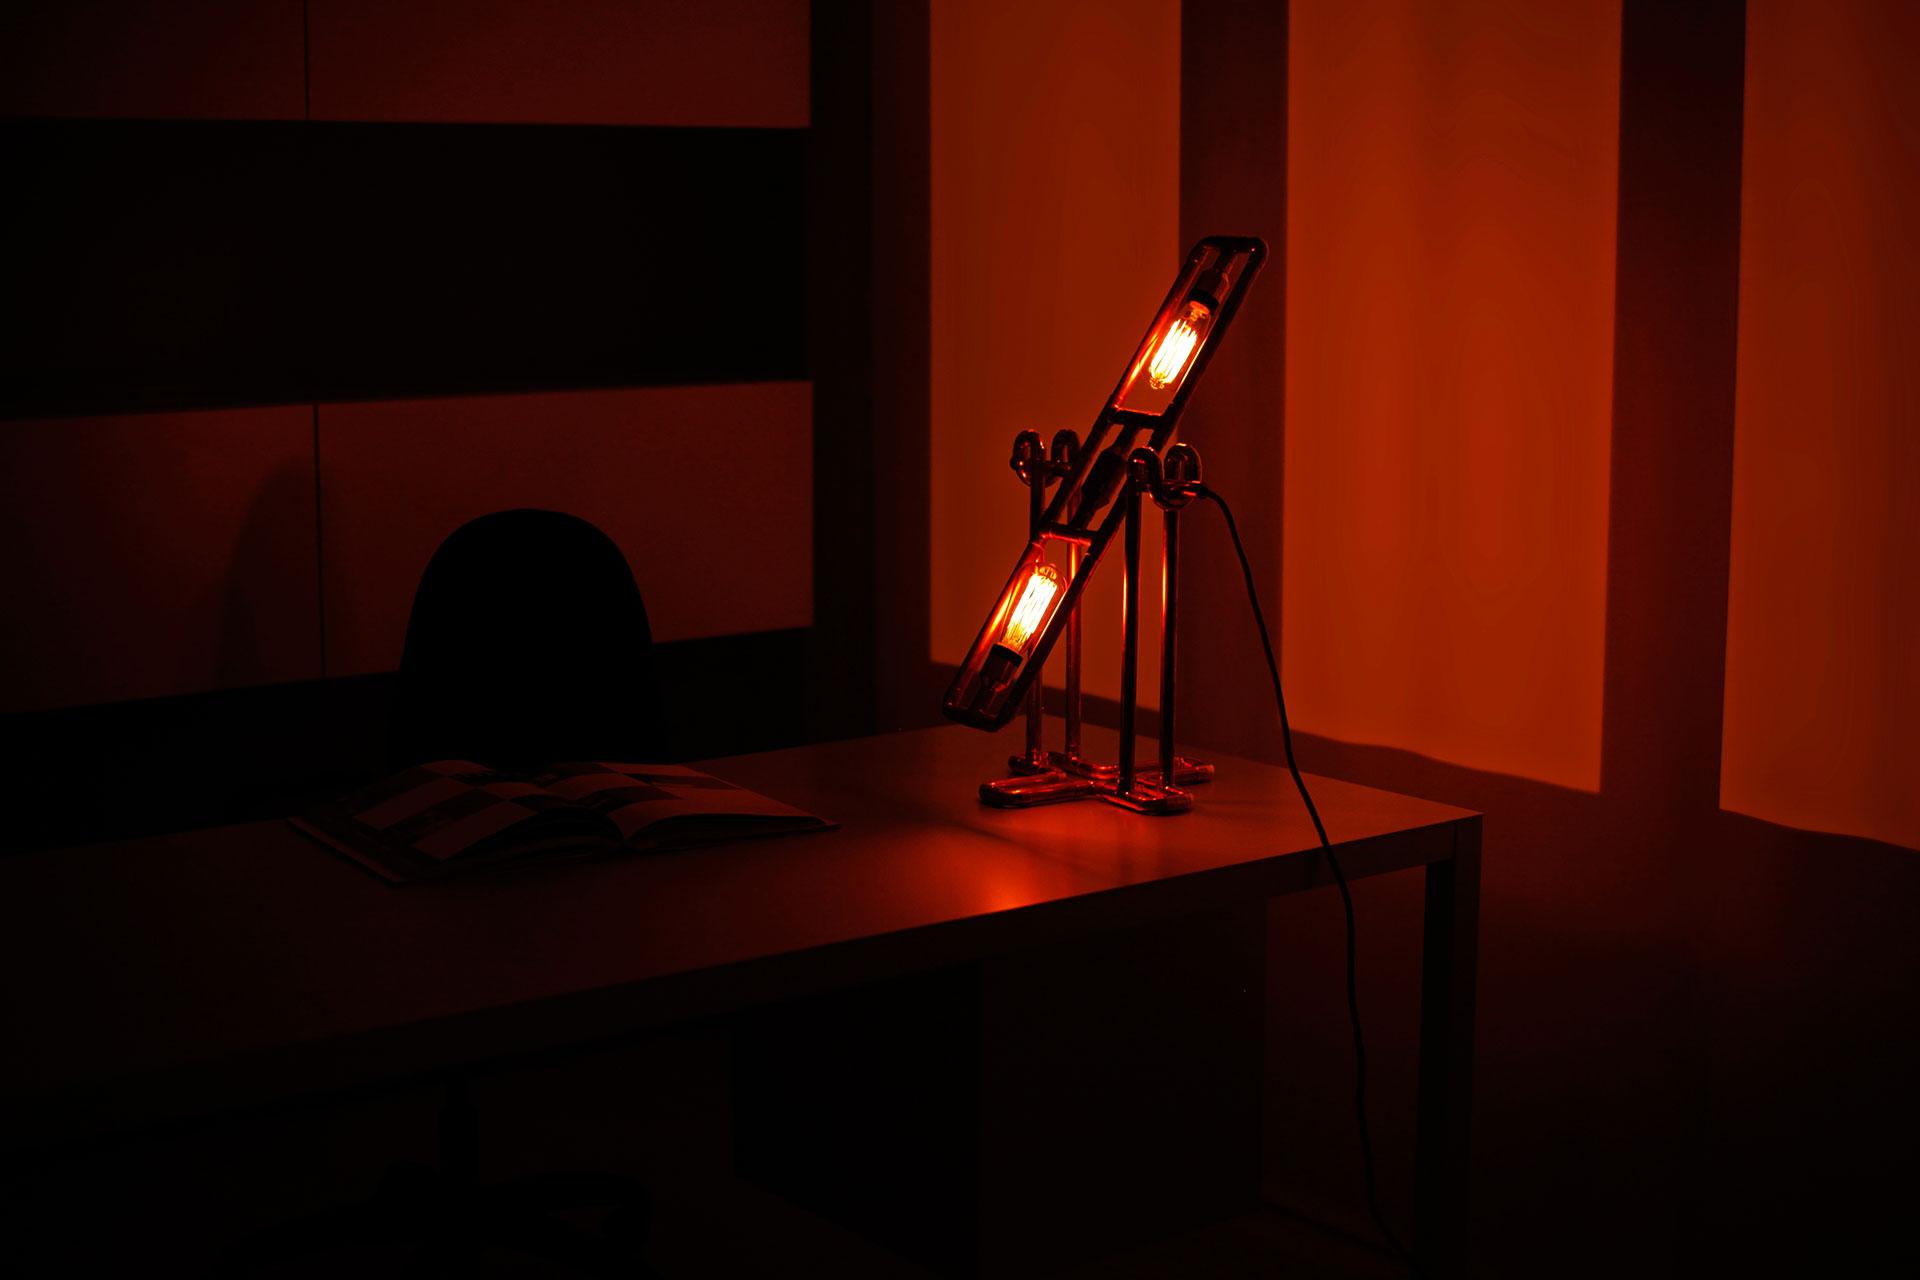 Industrial design desk lamp with vintage Tesla bulbs in modern masculine home office